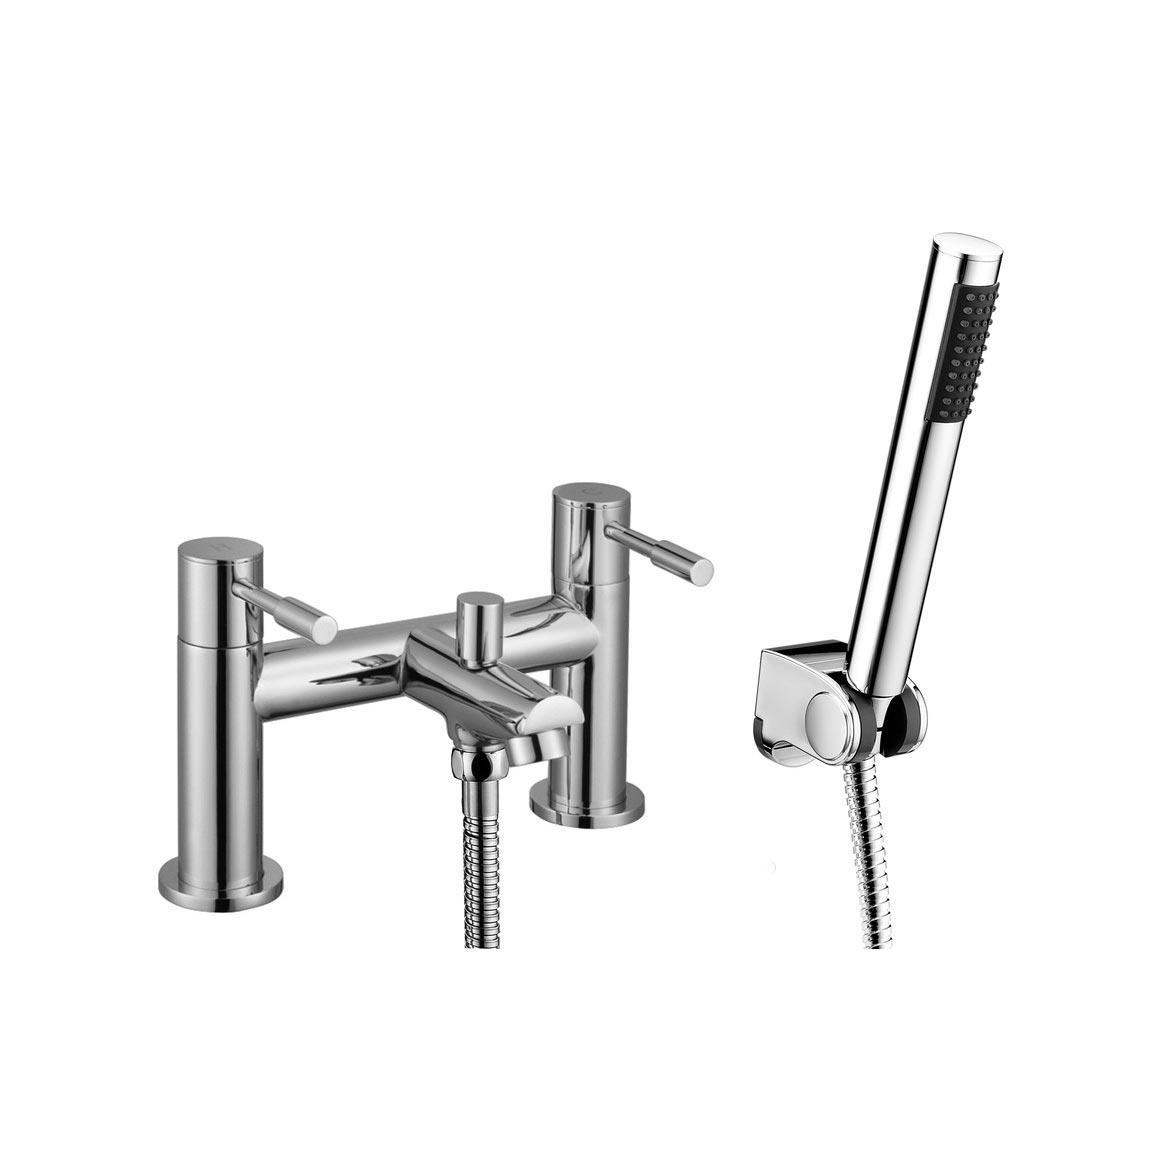 Primo Bath Shower Mixer Tap Chrome - Heat & Things